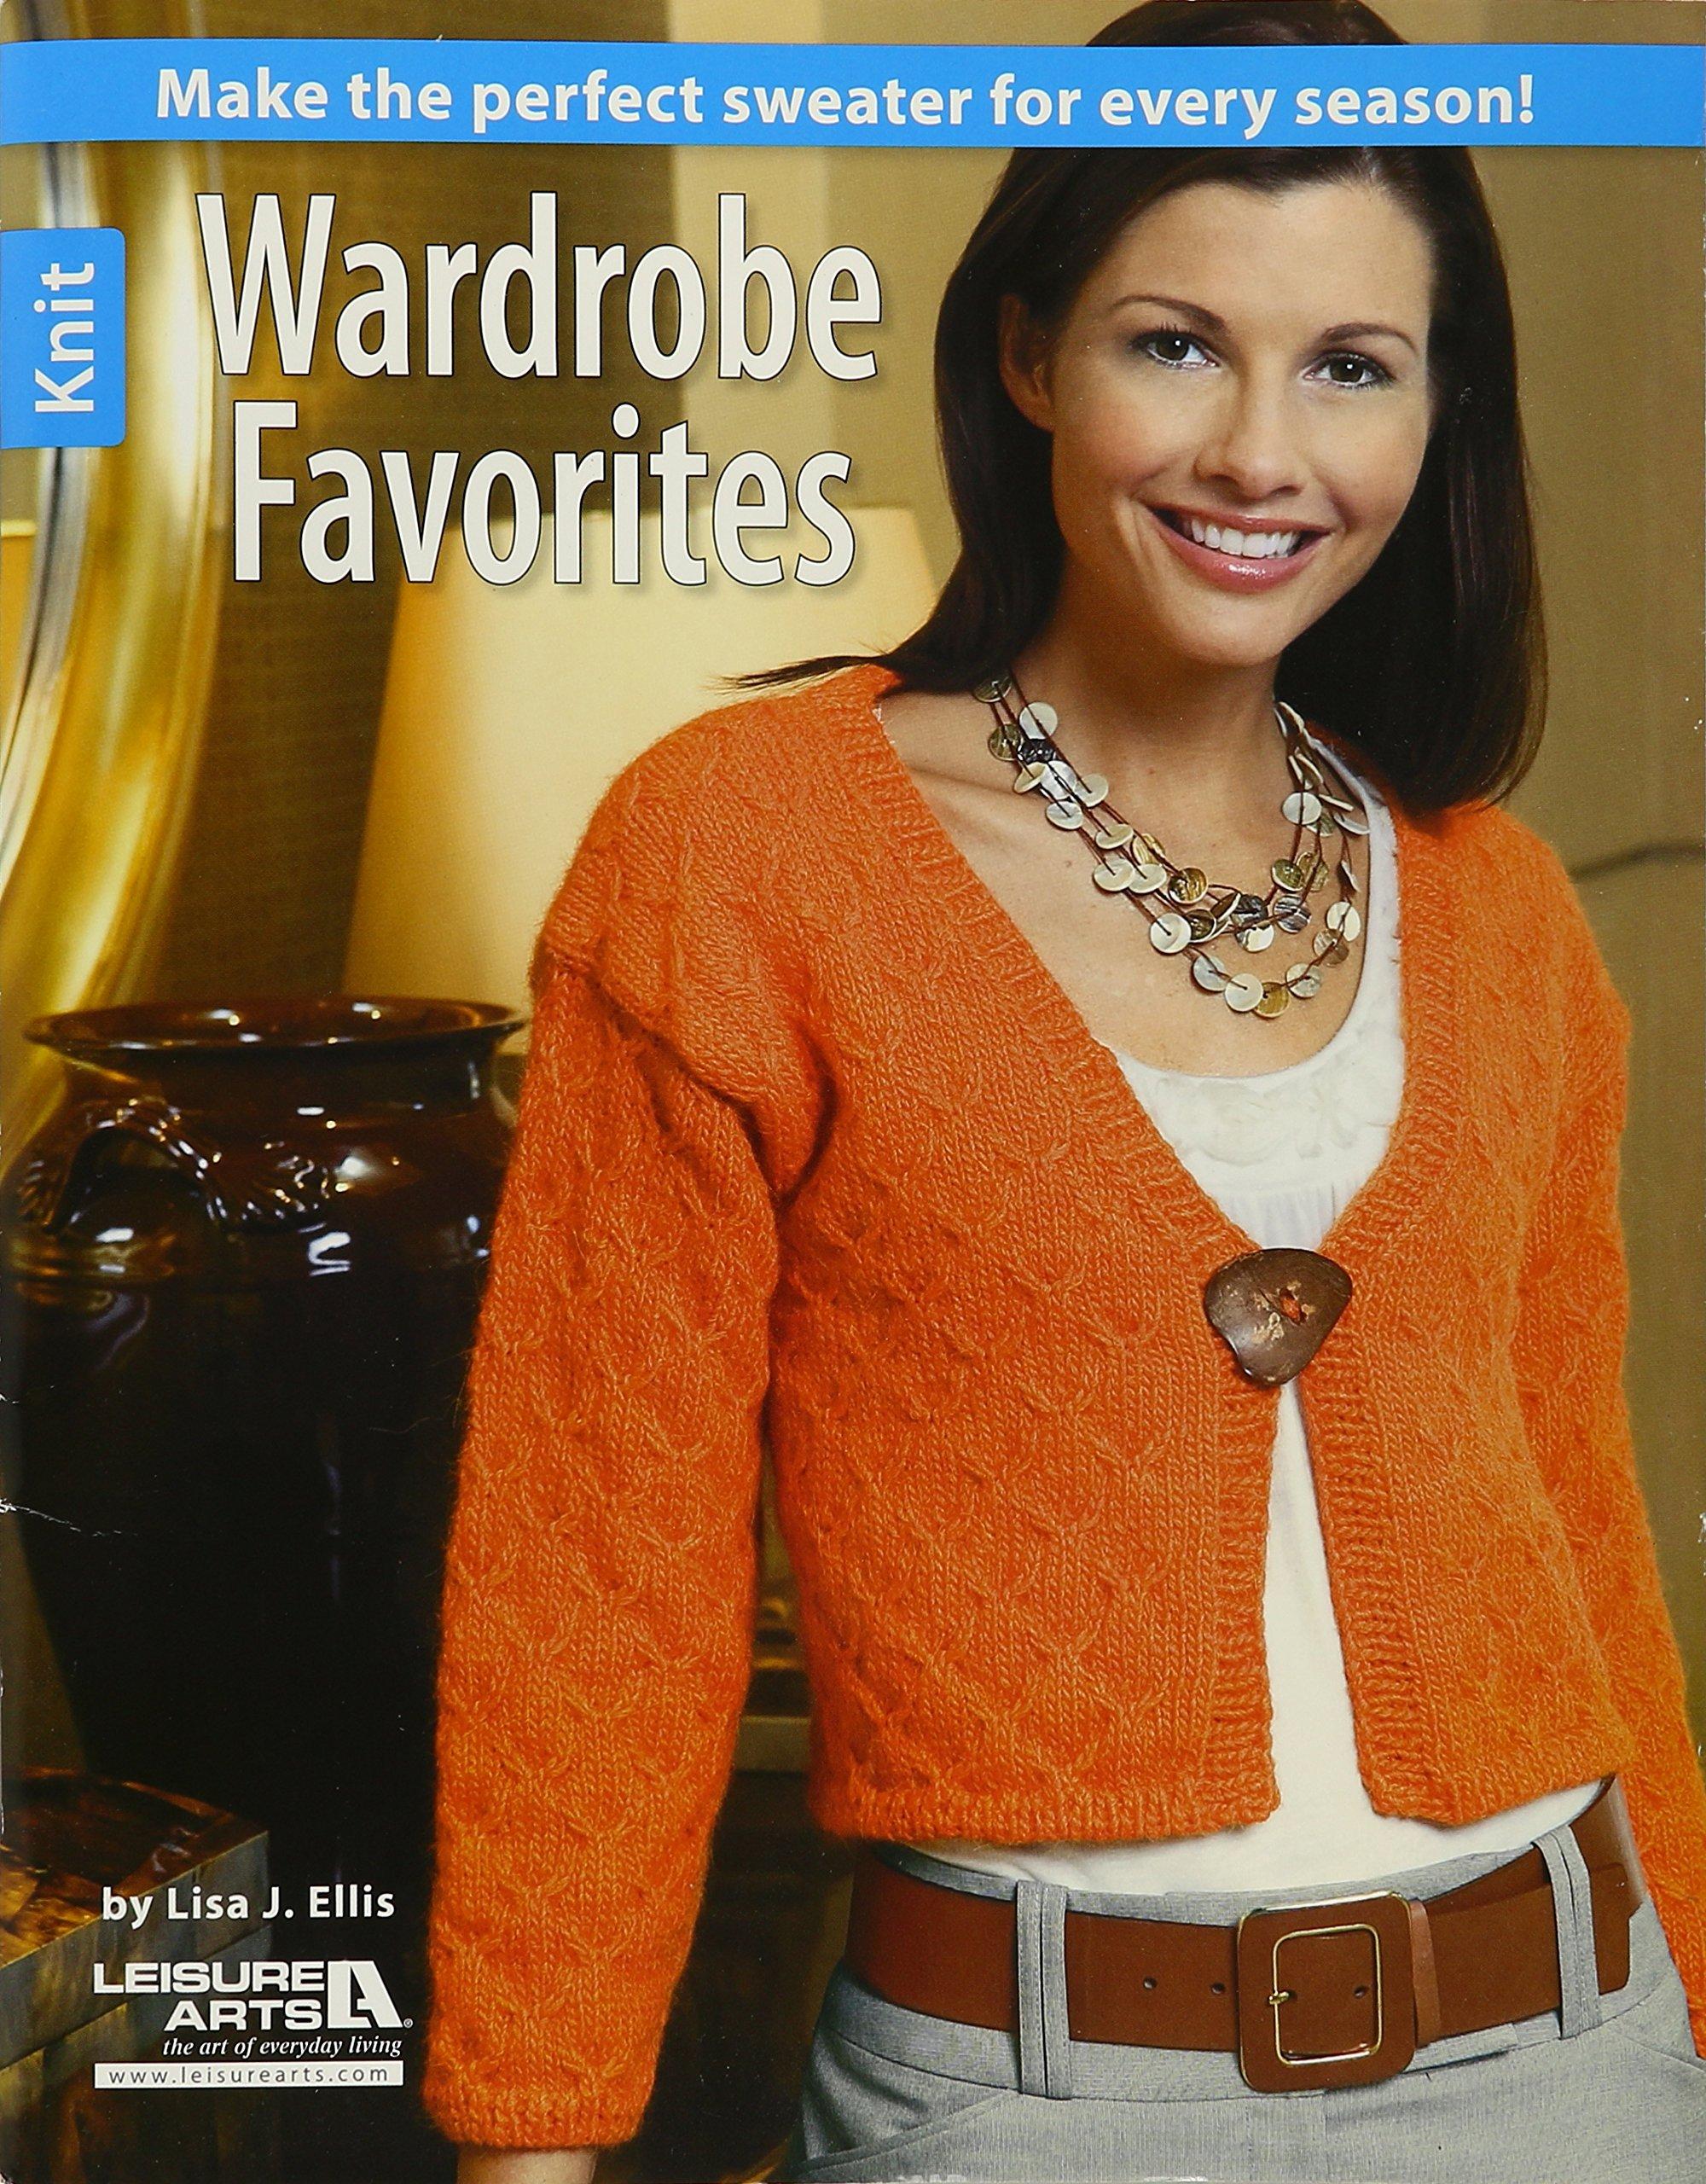 64784b1244d7 Wardrobe Favorites: Lisa J. Ellis: 9781464738661: Amazon.com: Books